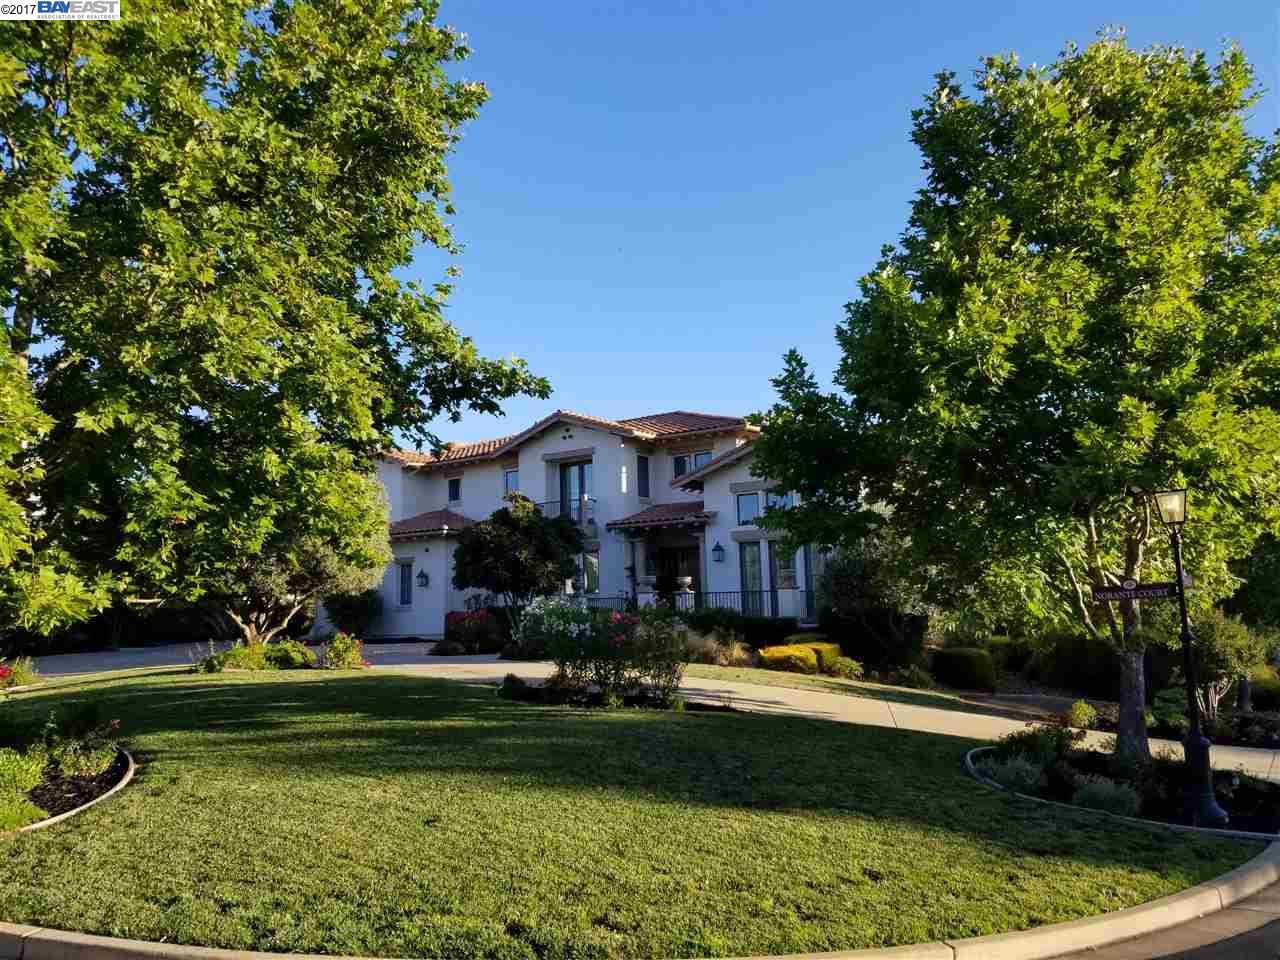 Single Family Home for Sale at 637 Norante Court Pleasanton, California 94566 United States